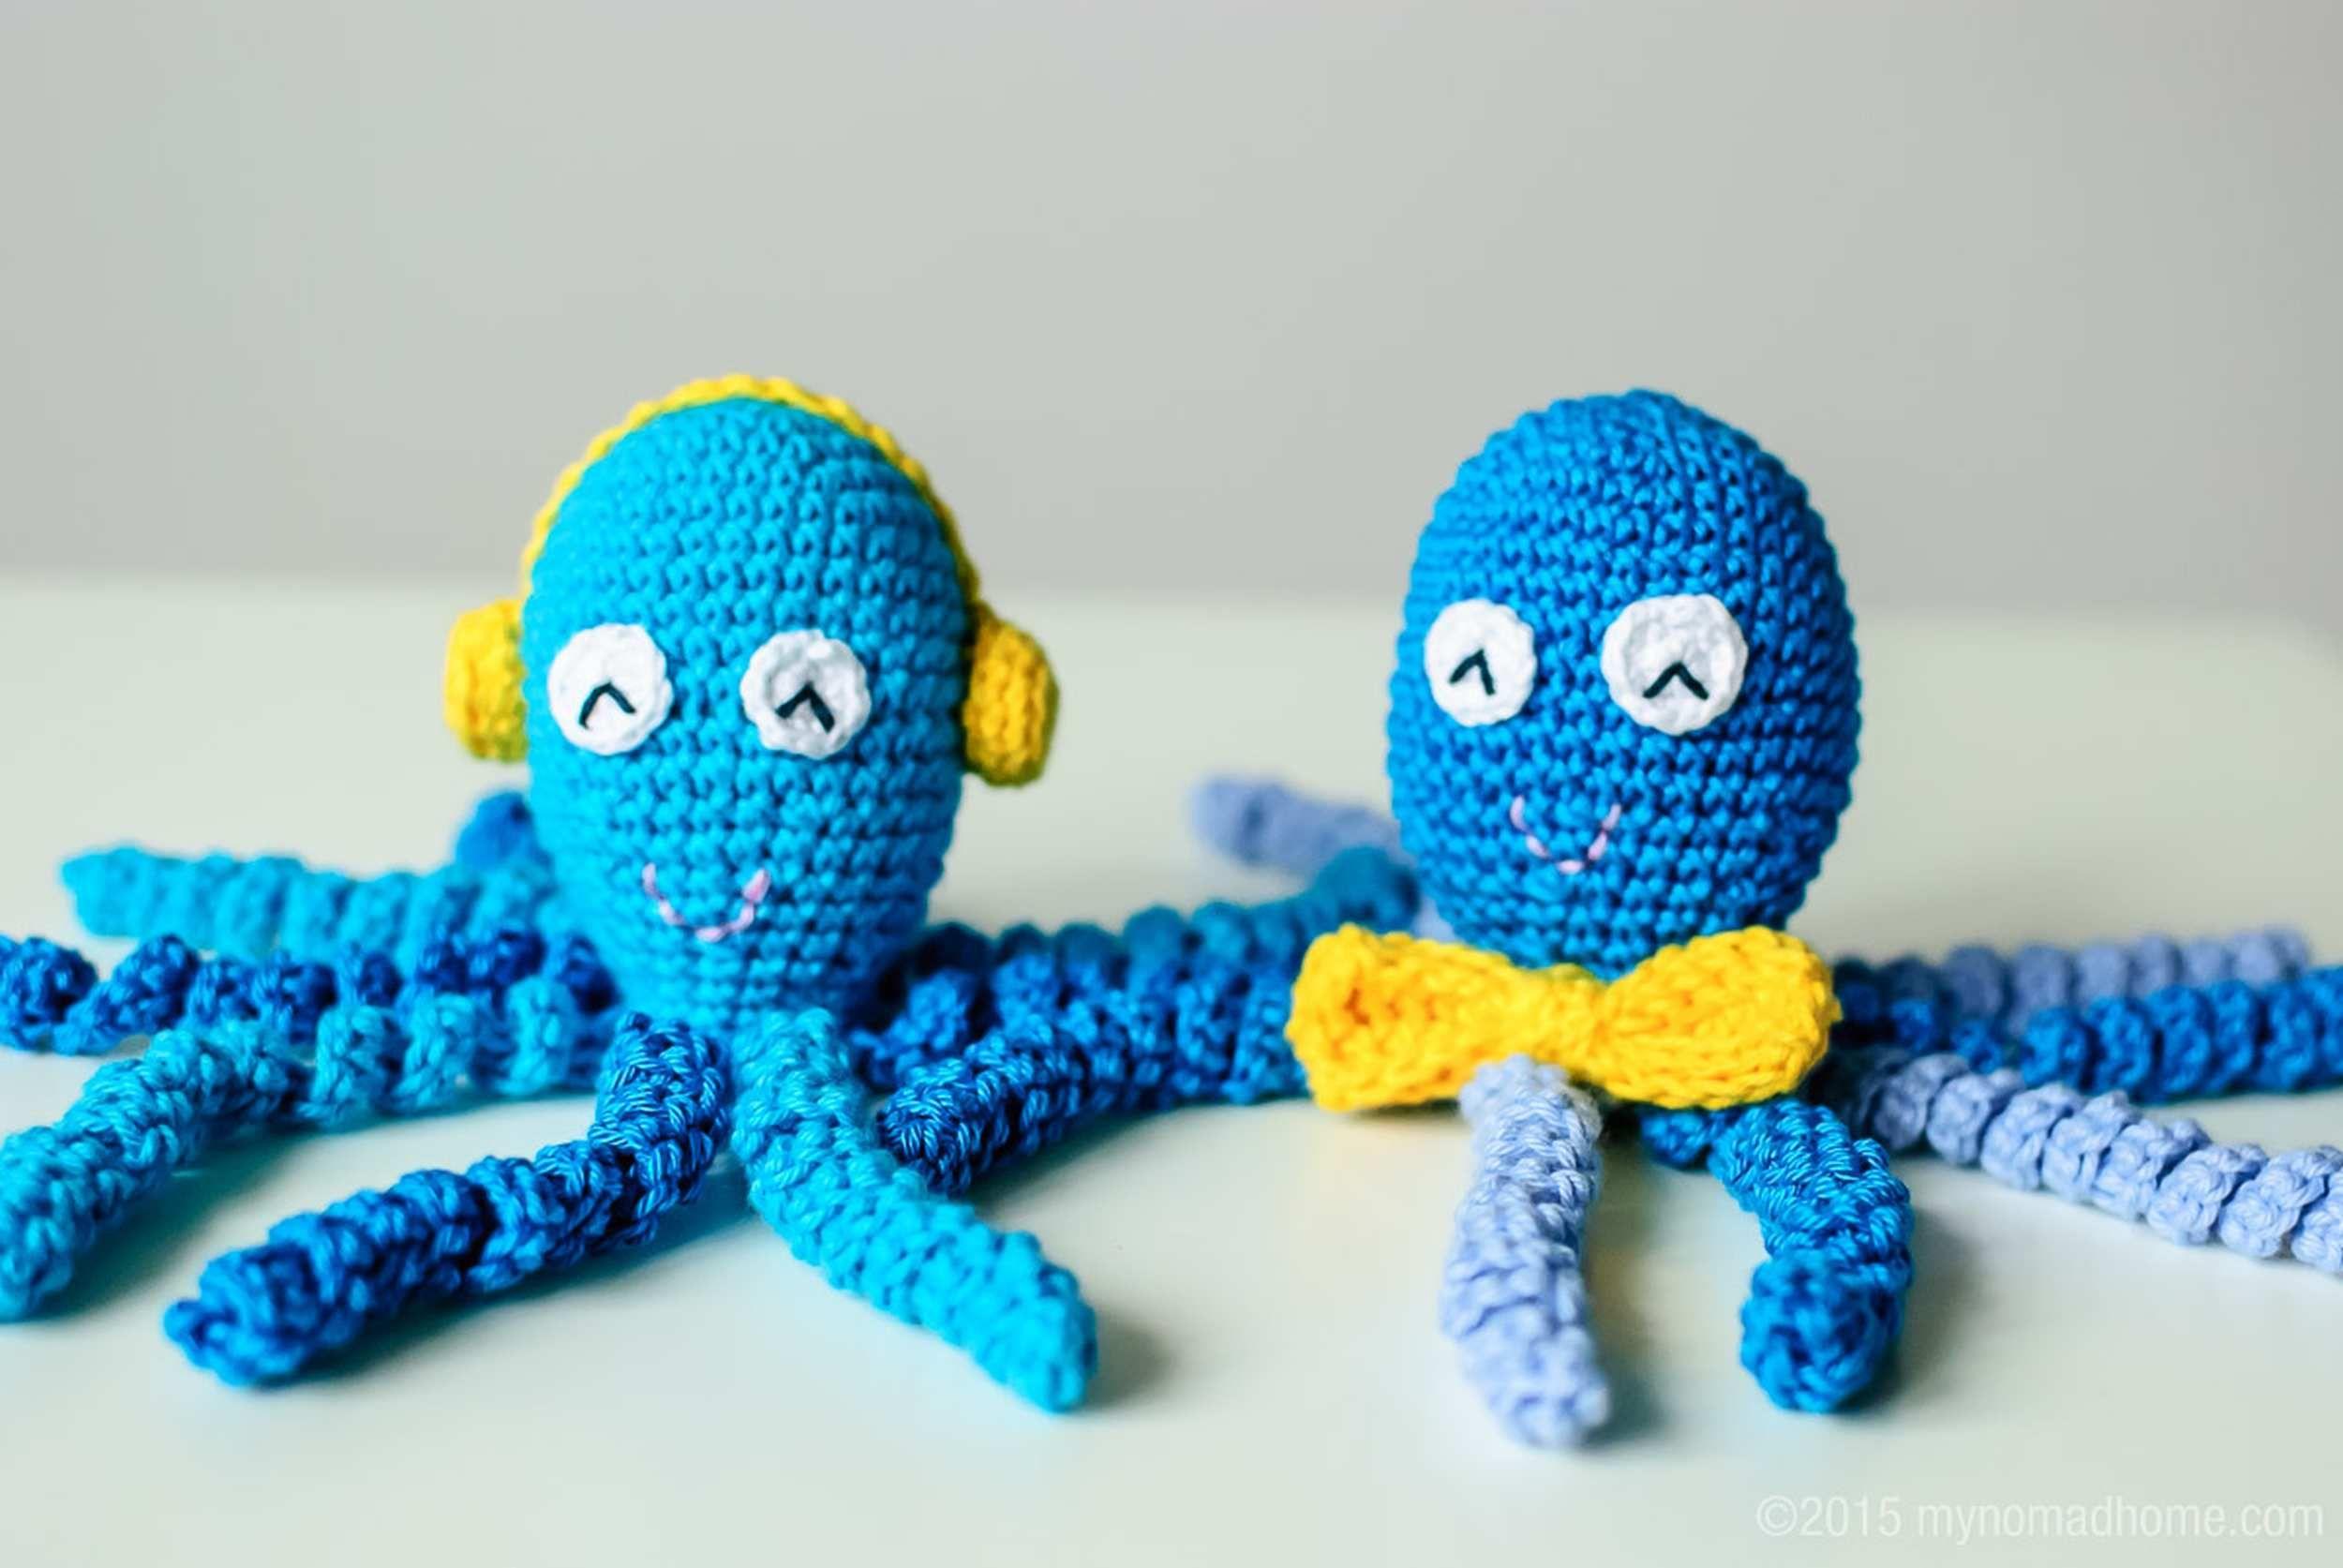 octopus for a preemie | Crochet | Pinterest | Preemies, Crochet and ...